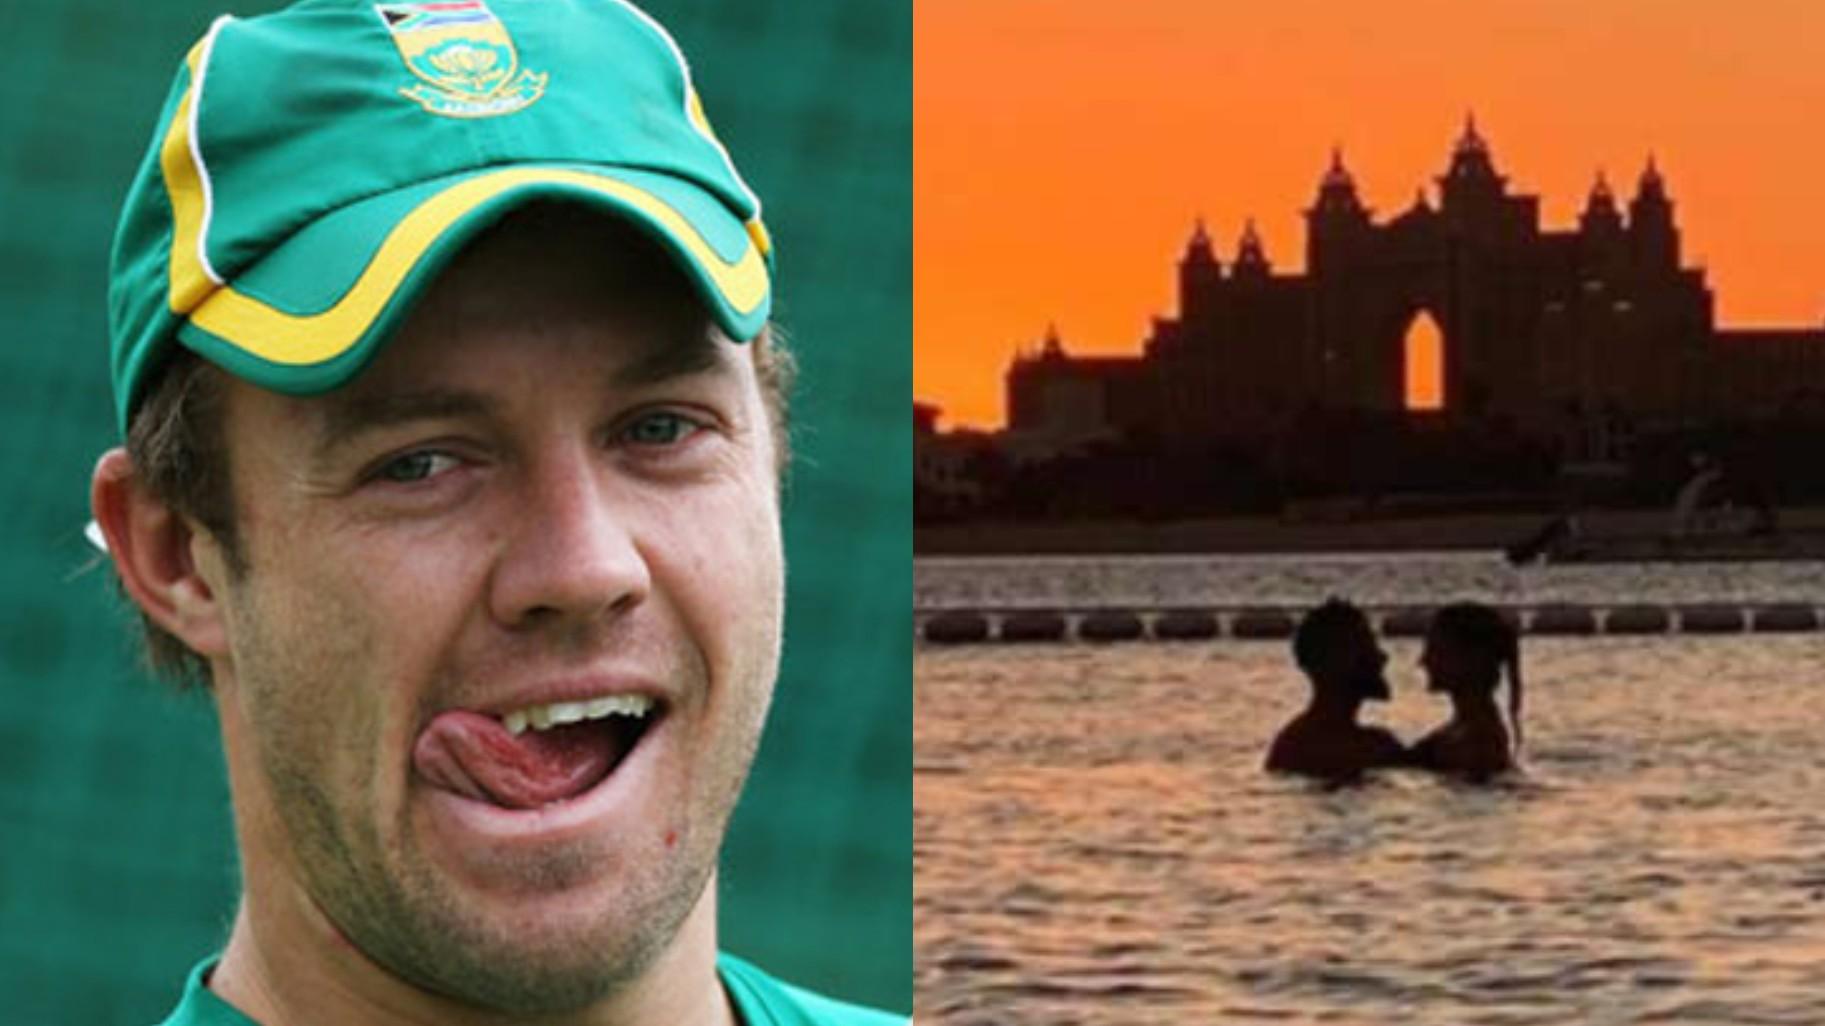 IPL 2020: AB de Villiers clicks a romantic sunset pic of Virat and Anushka